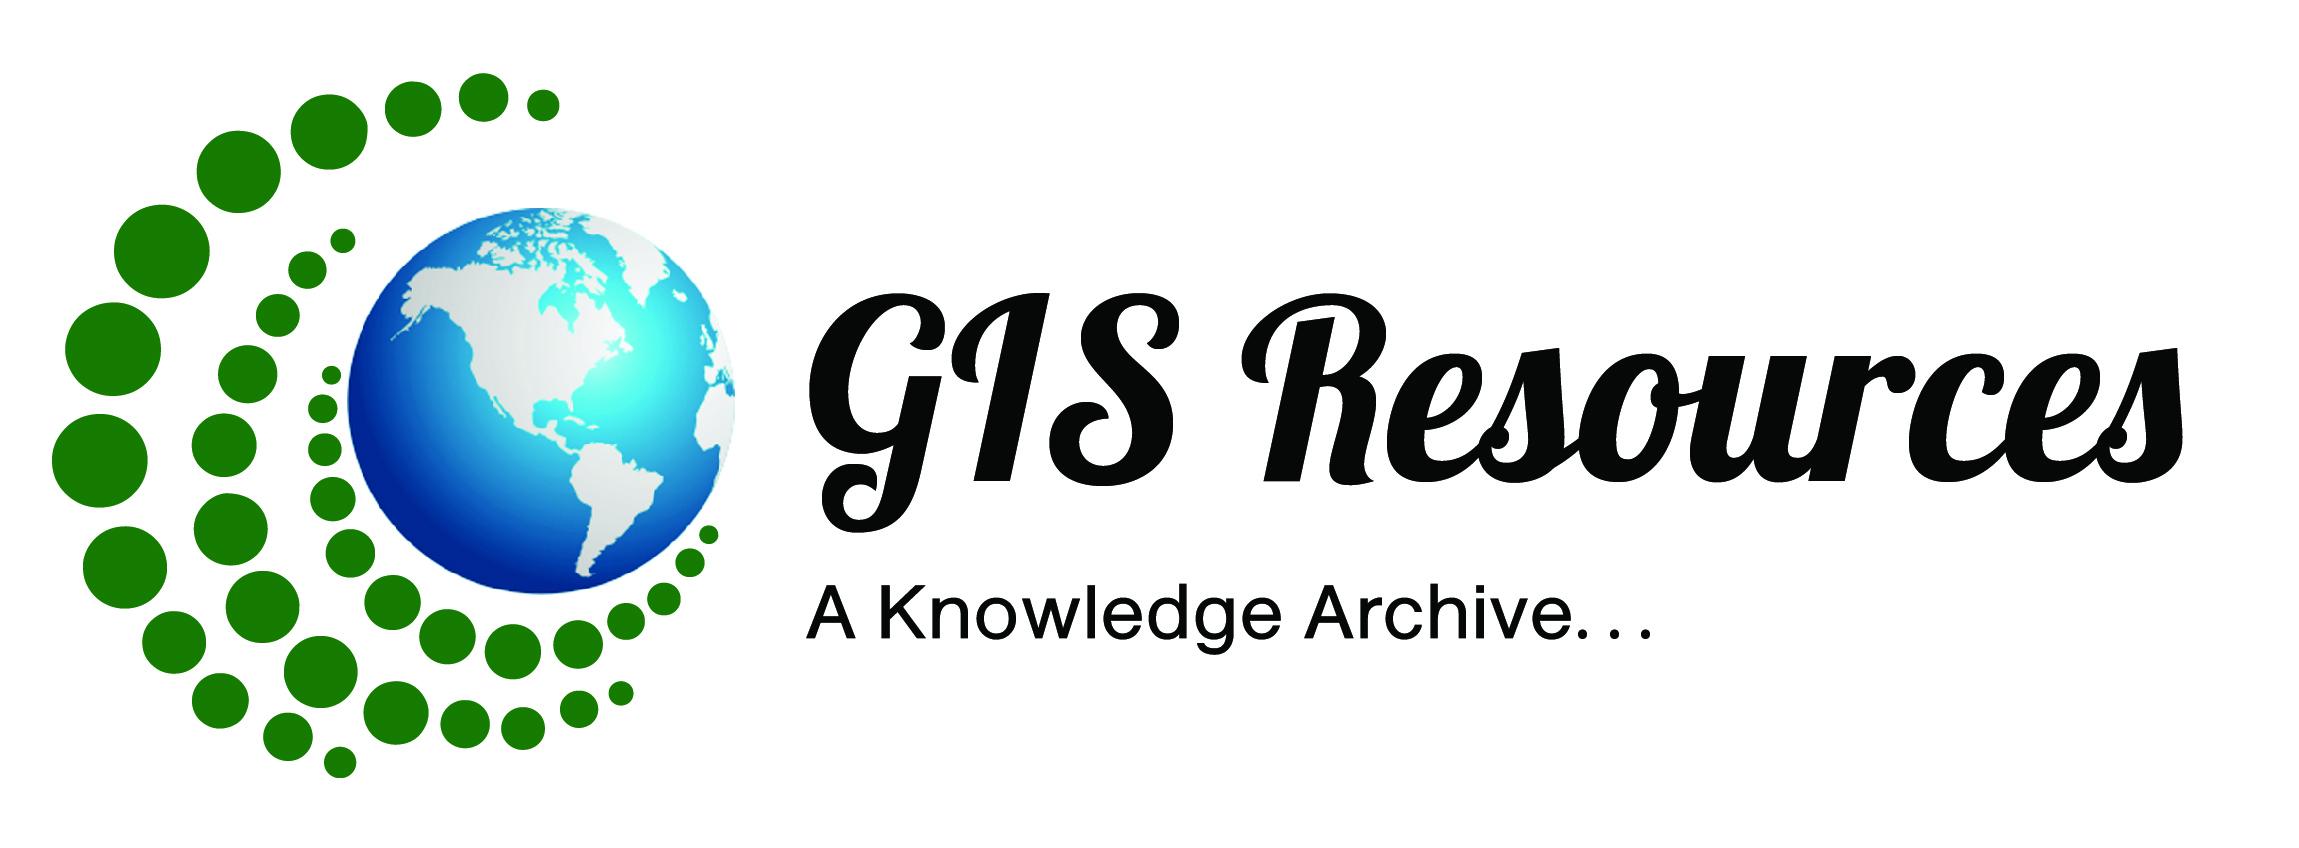 GISResources_logo-Copy-2